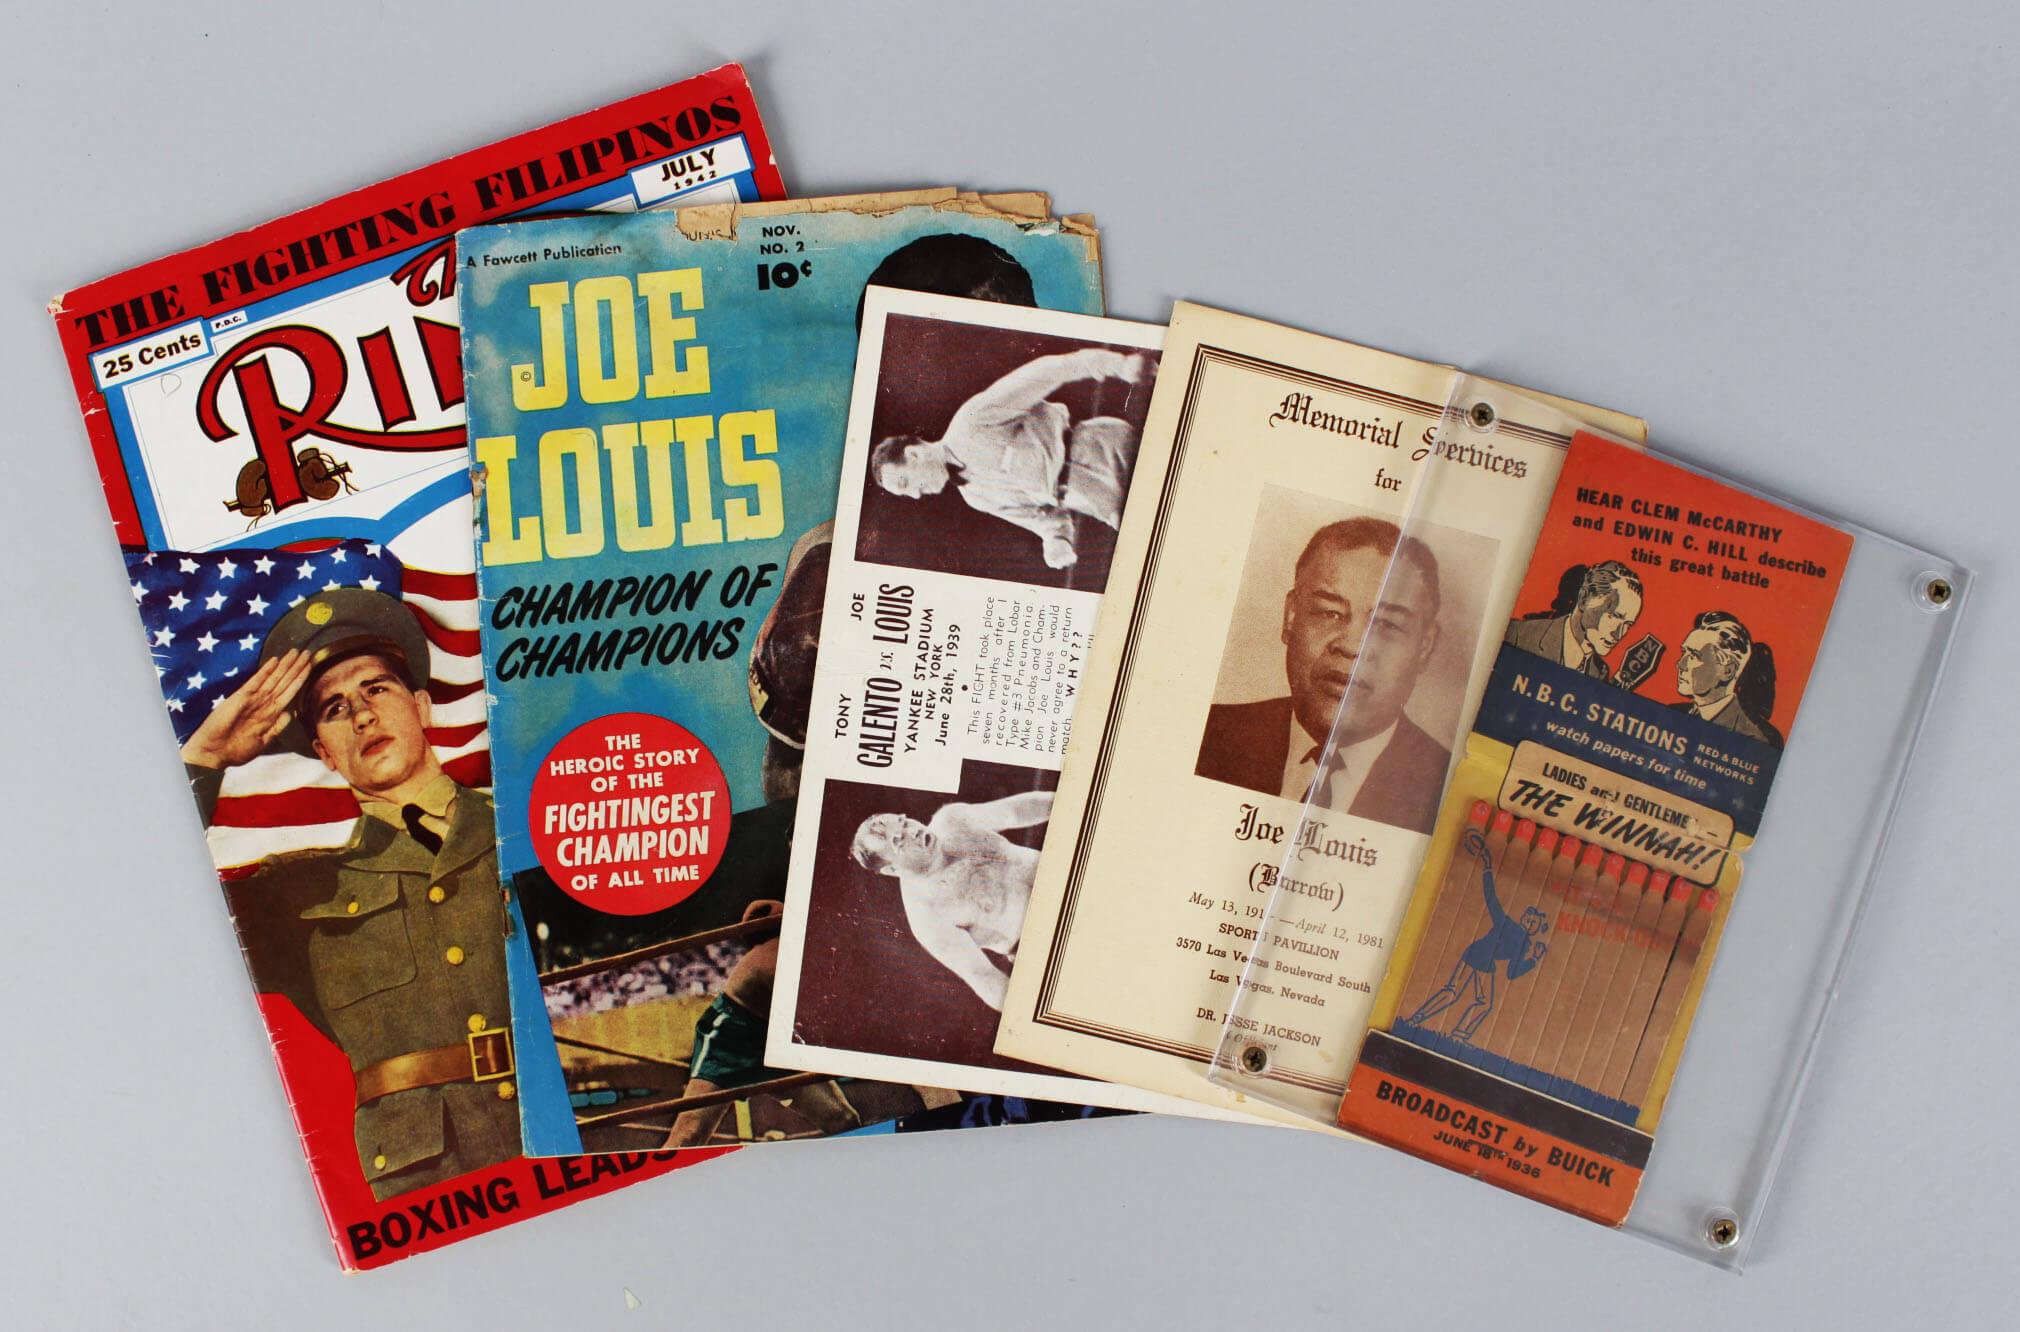 Boxing Legend Joe Louis Lot - (2) Magazines, Post Card, Memorial Service Program & 1936 Biggest Match Book